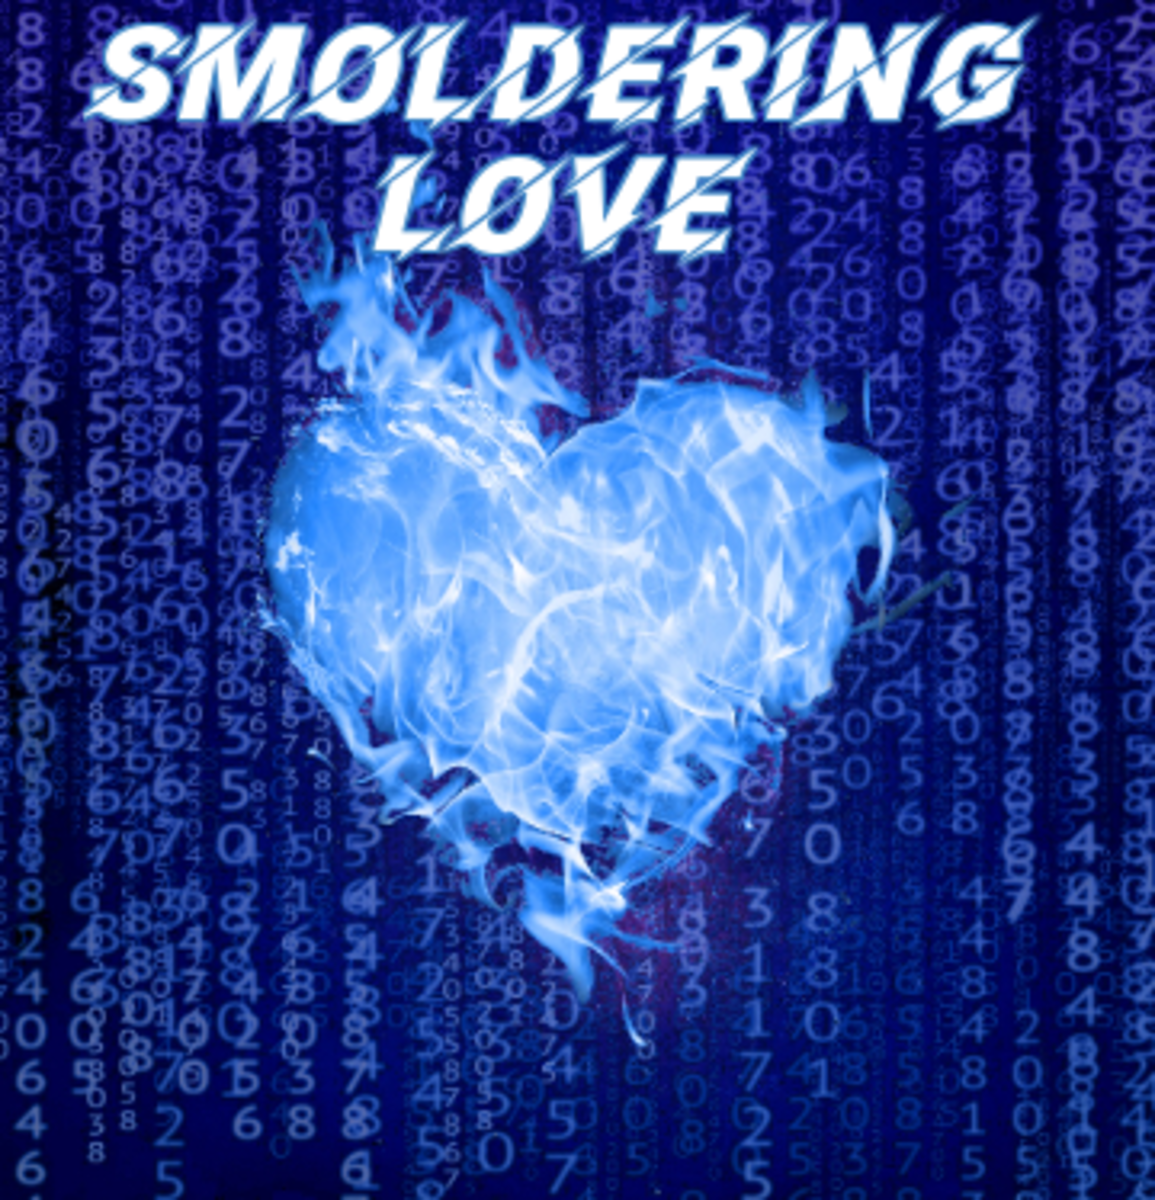 poem-smoldering-love